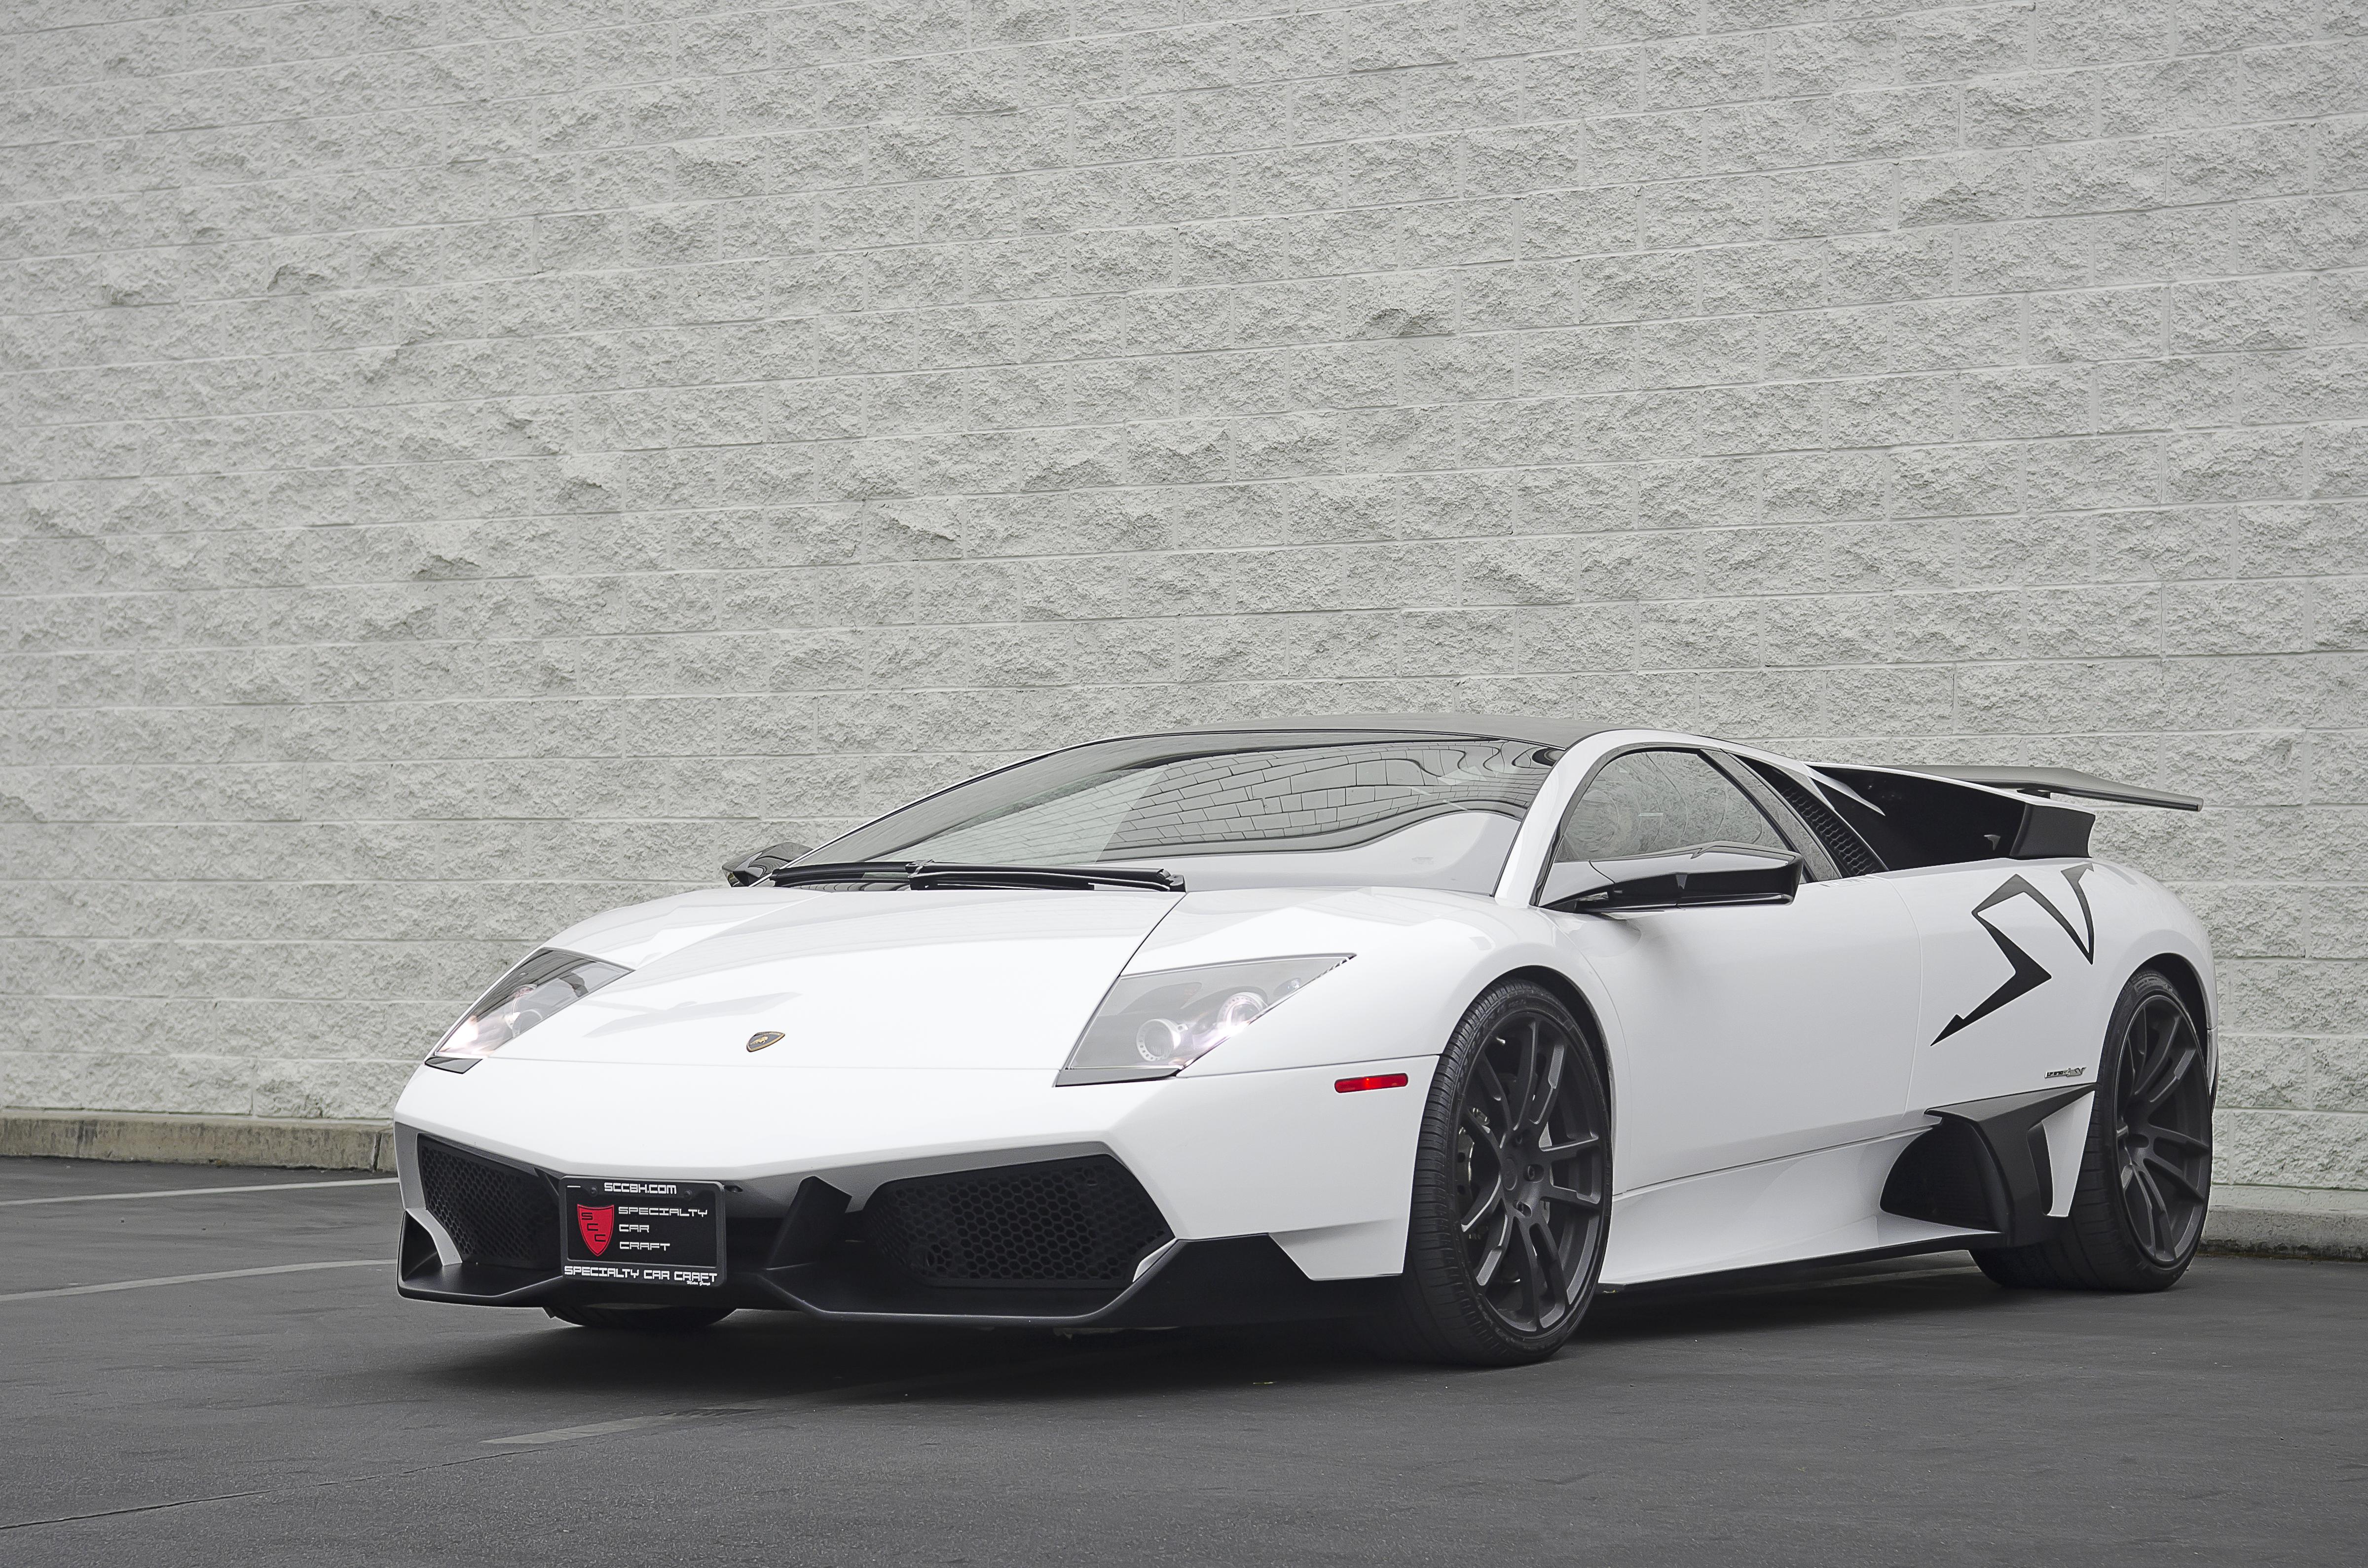 Superb File:Lamborghini Murcielago LP670 4 SV By Specialty Car Craft (14202005520).